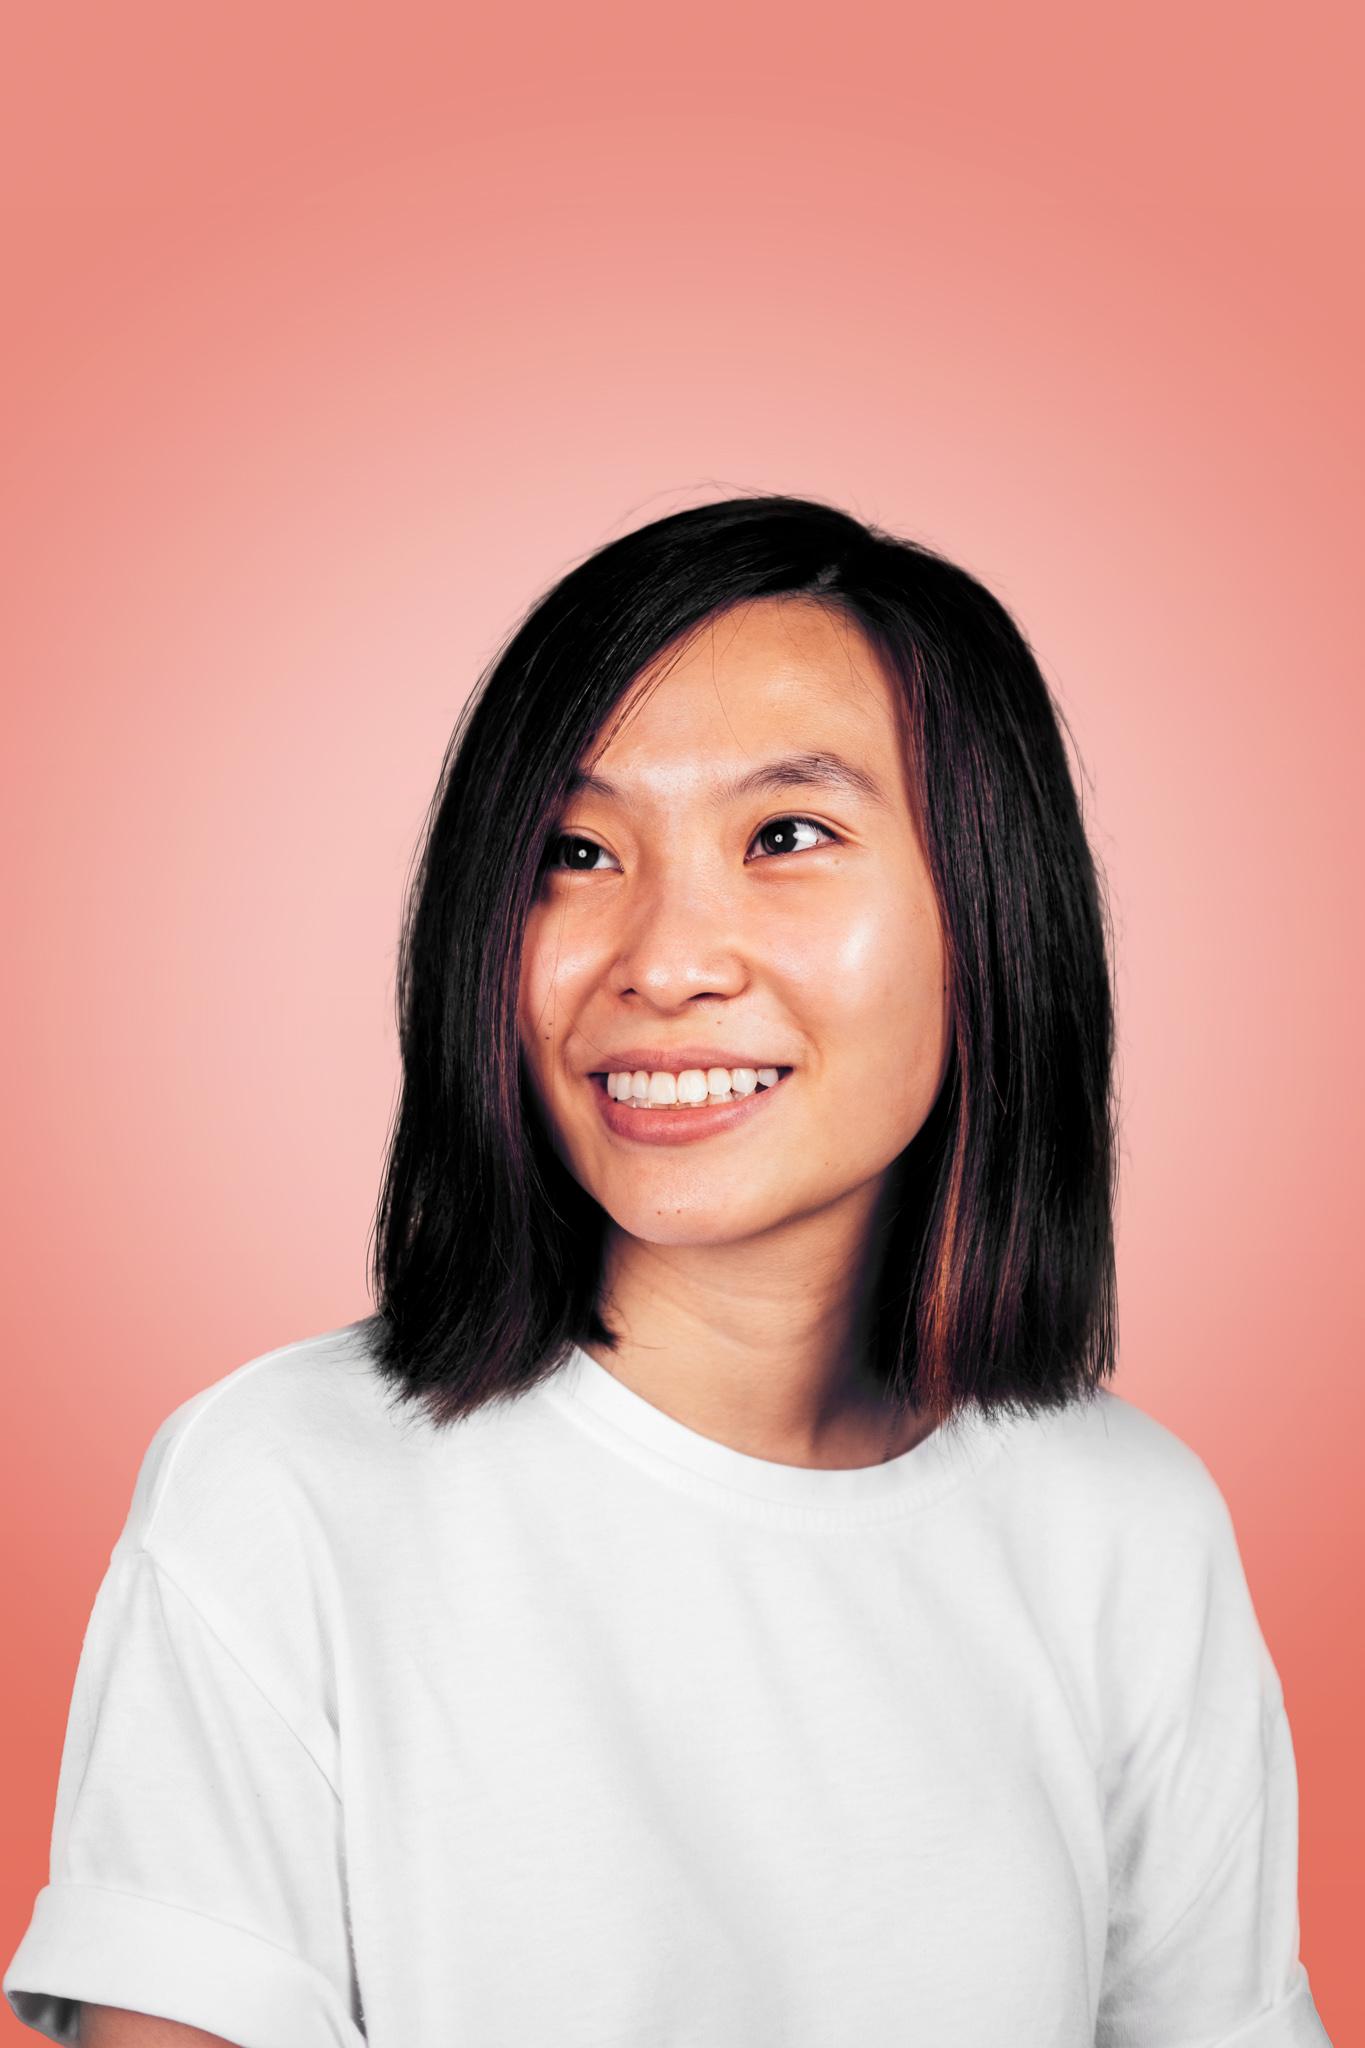 Jasmine Yuen, Kith&Kin Designer